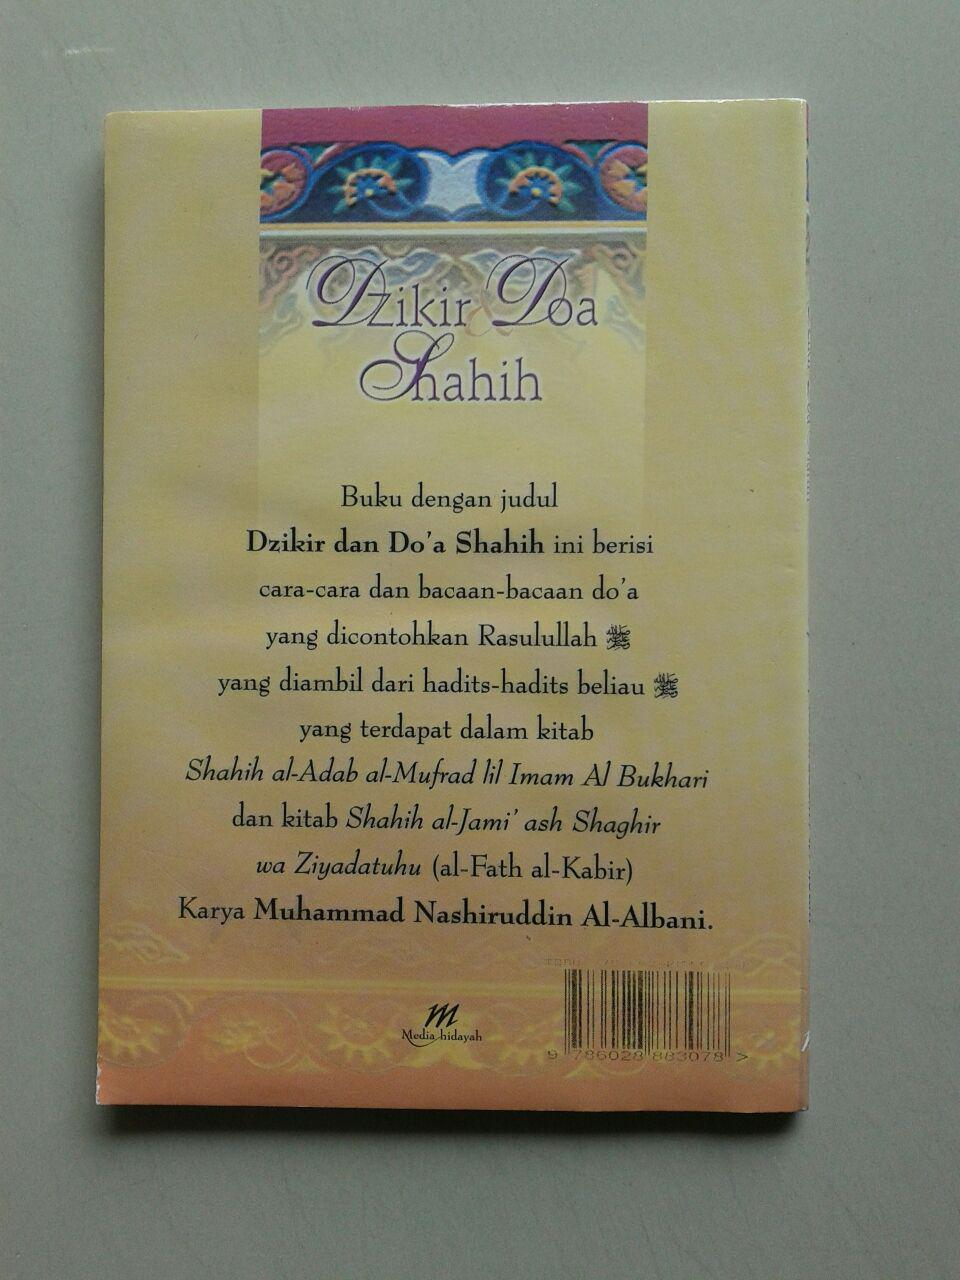 Buku Saku Dzikir Doa Shahih (dari Shahih Adabul Mufrad) cover